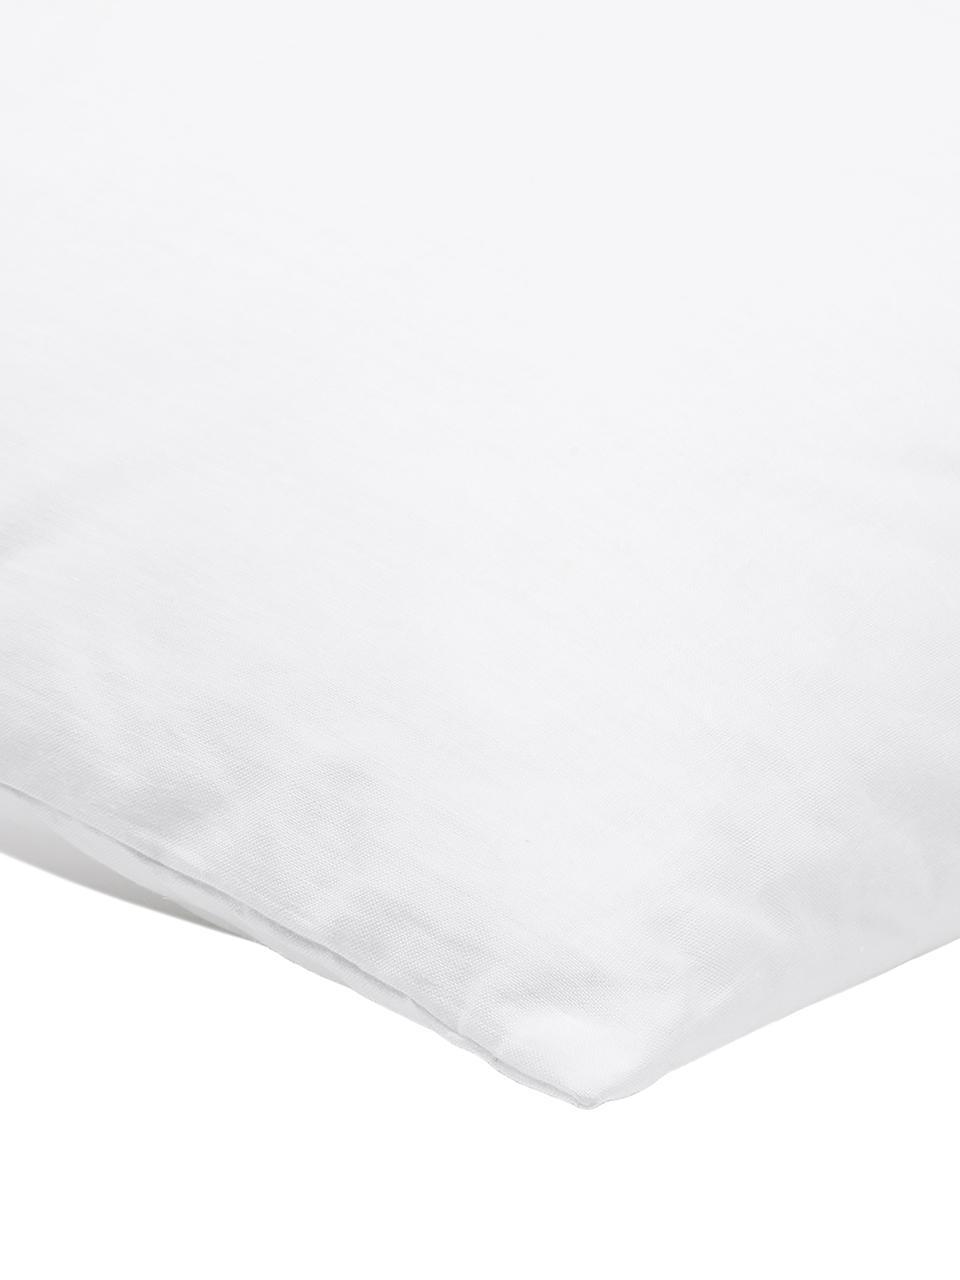 Microvezel sierkussenvulling Sia, 60 x 60 cm, Wit, 60 x 60 cm